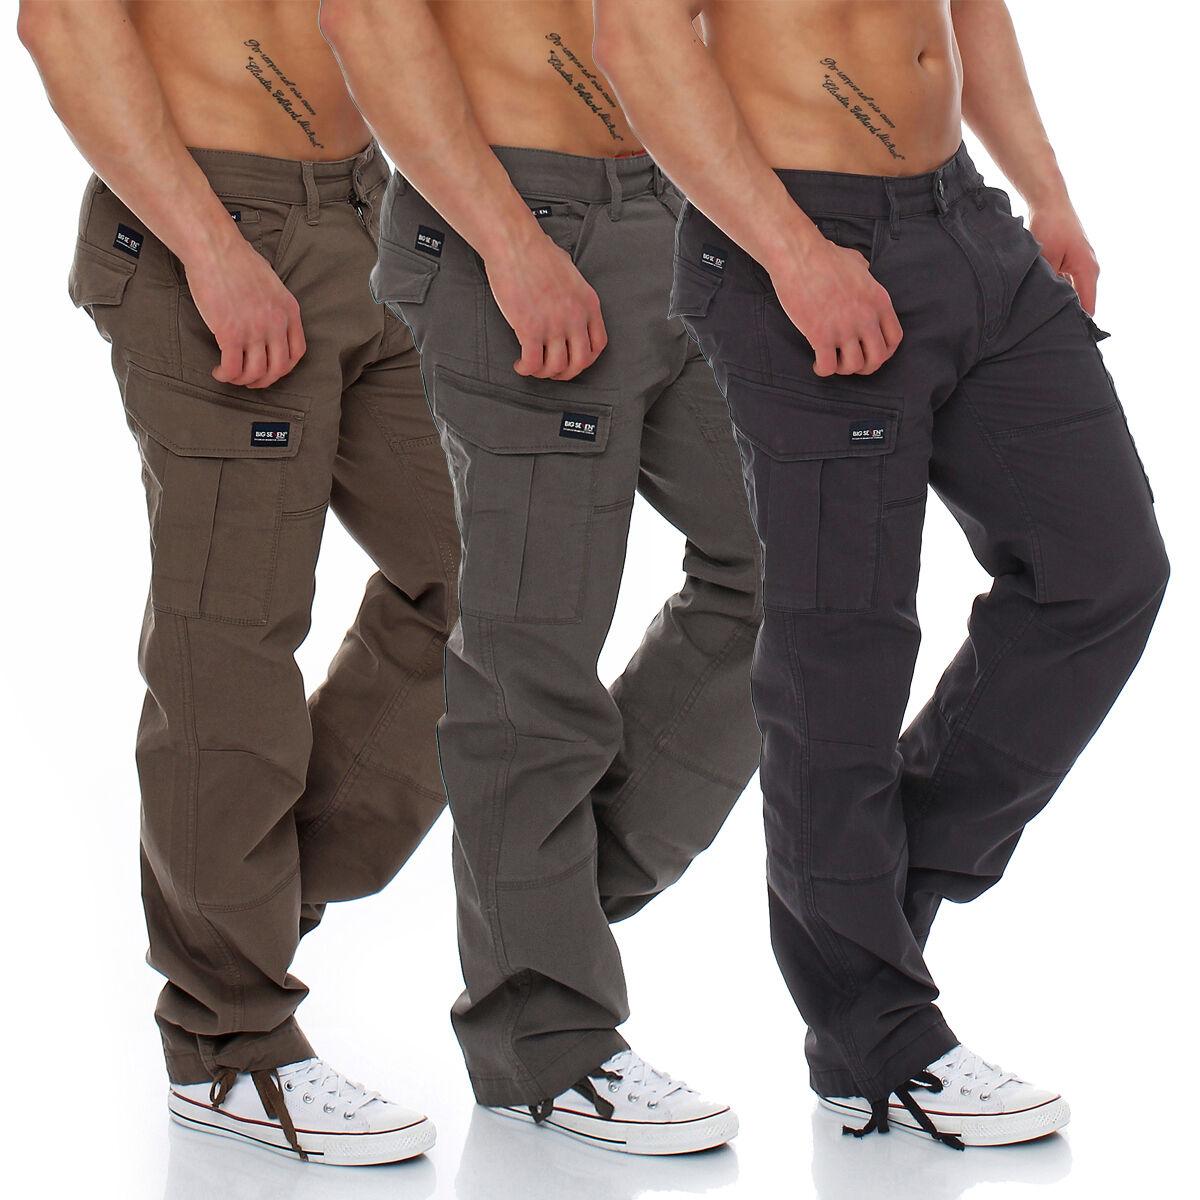 Big Seven - Brian - Cargo Trousers Comfort Fit - XXL Oversize - Men's Jeans -